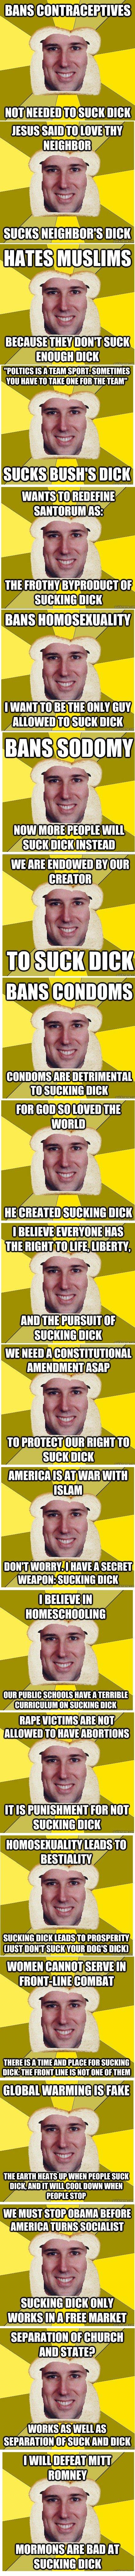 Breadfriend Santorum. You have to know the meme first. breadfriend santorum